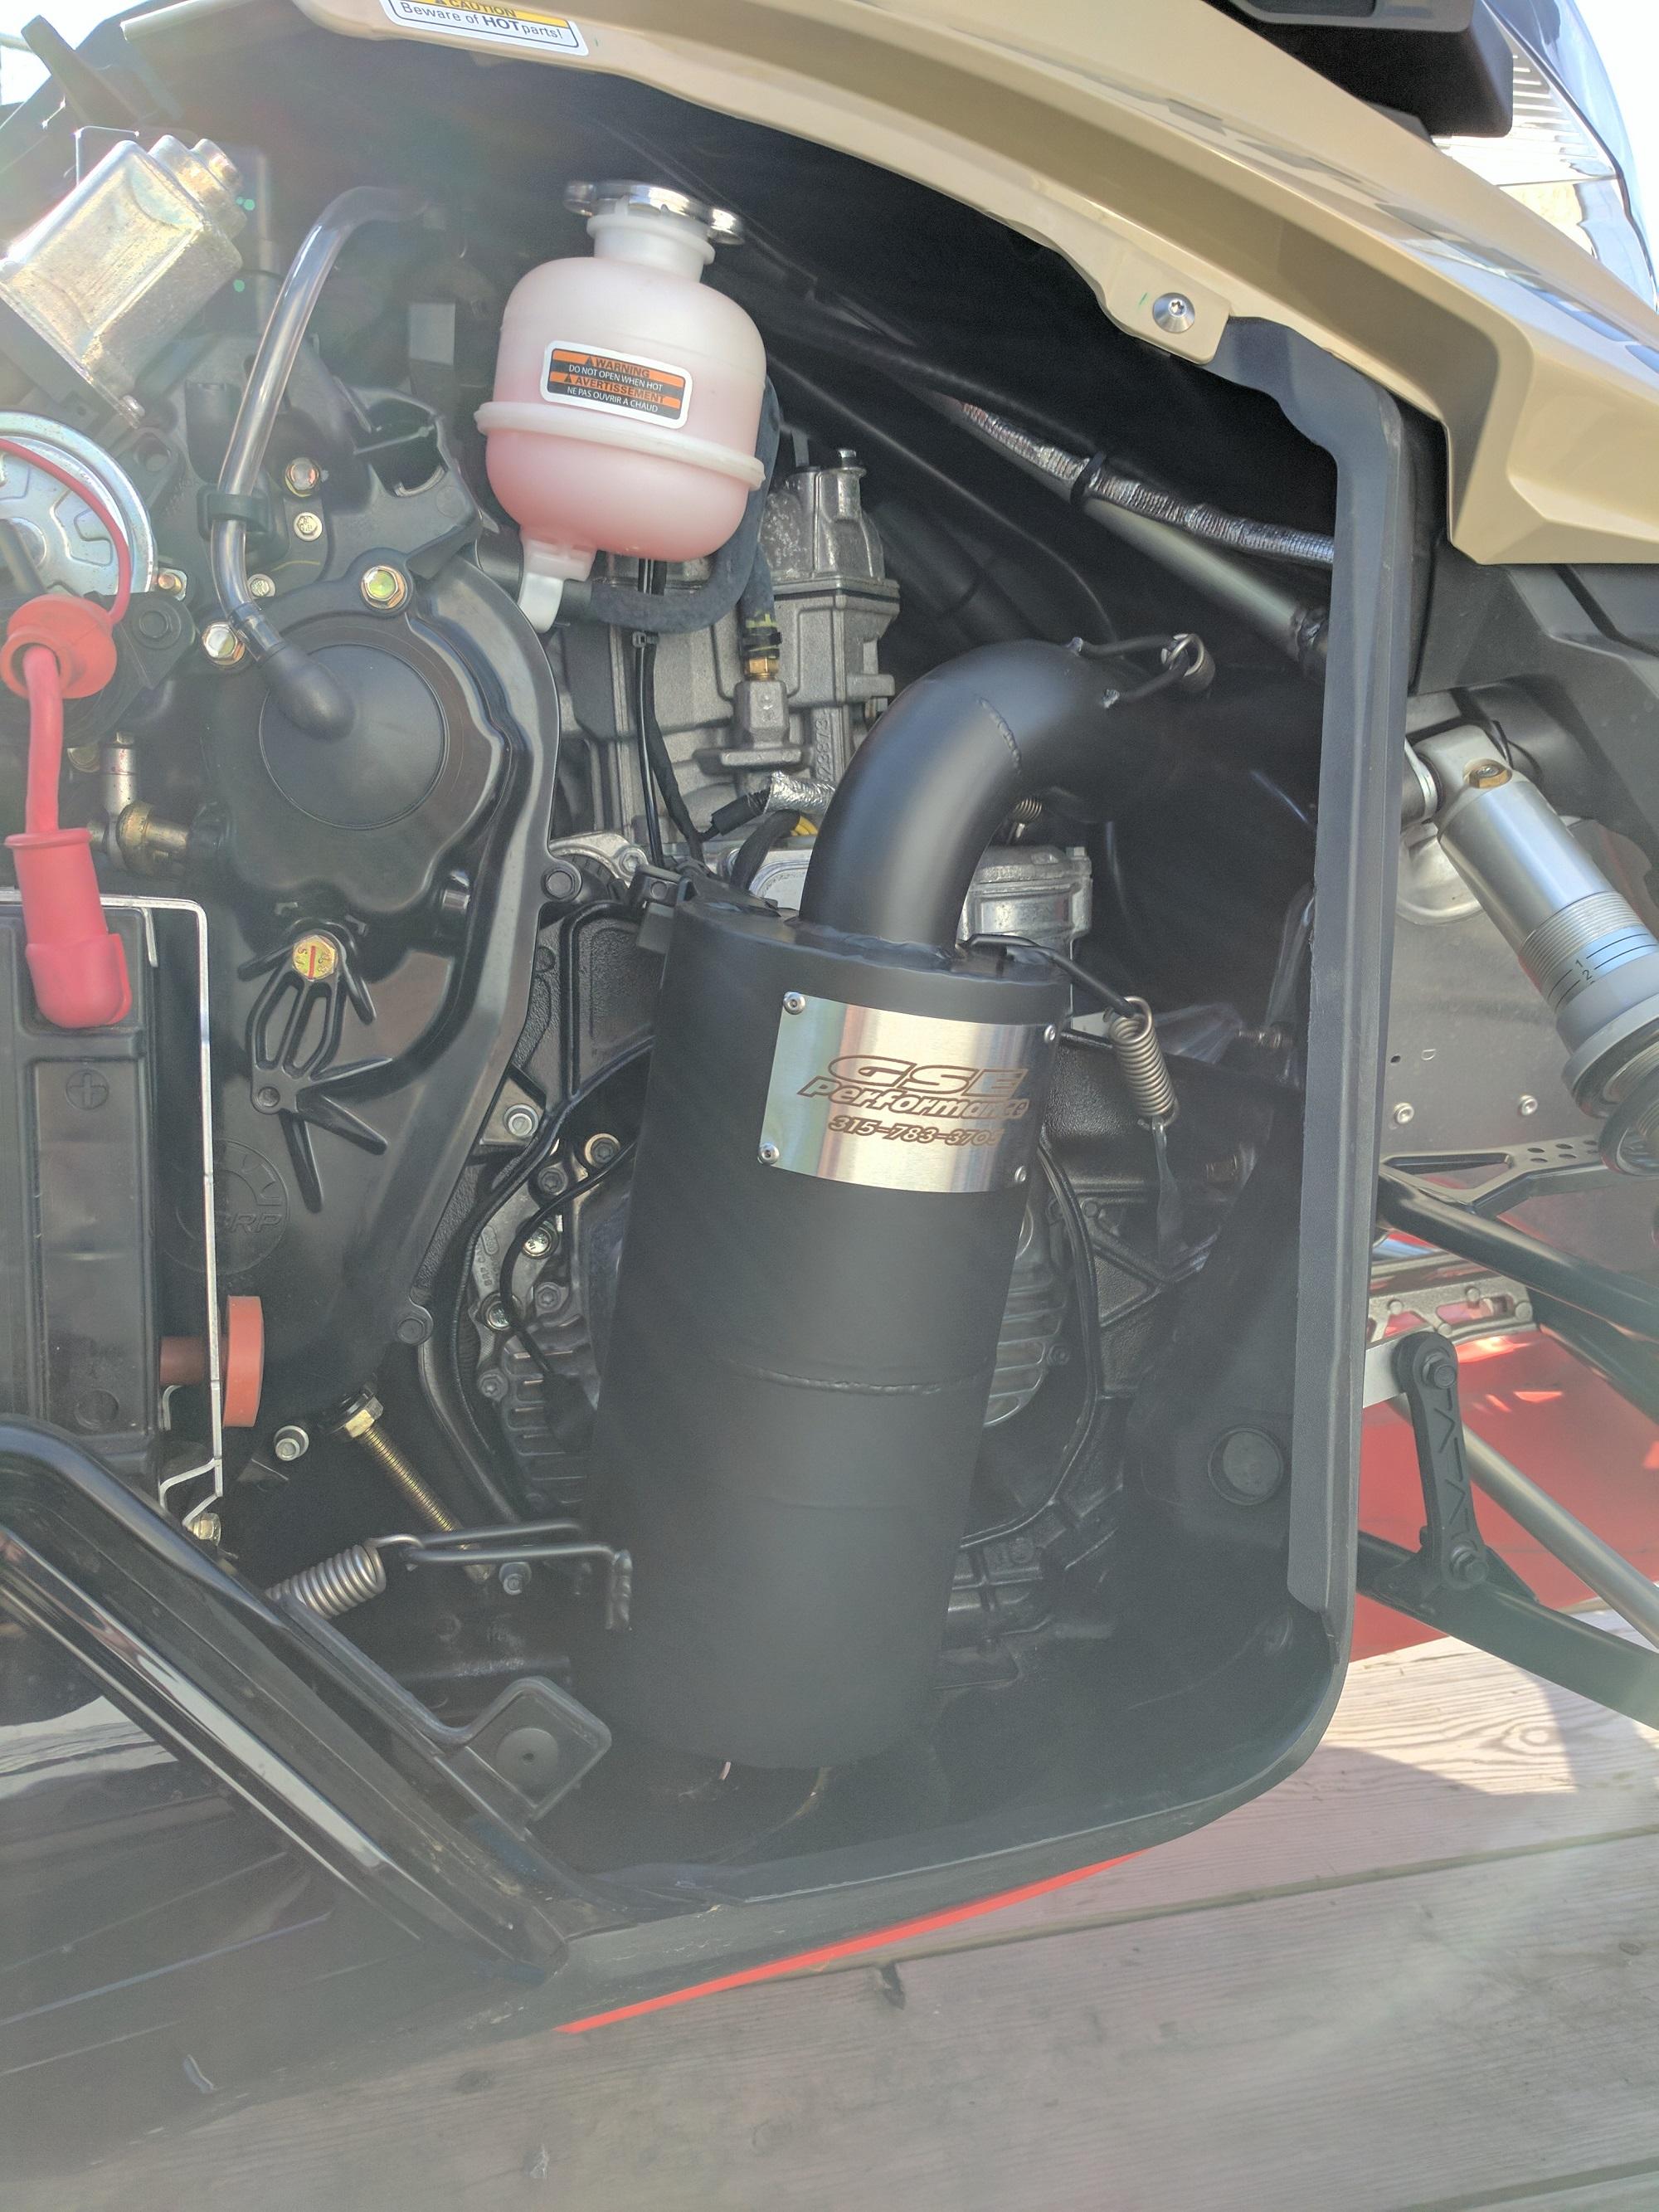 Ski Doo 900 Ace Trail Stalker Muffler Exhaust Can Gse Performance 2004 Polaris Sportsman 700 Fuel Filter Lightbox